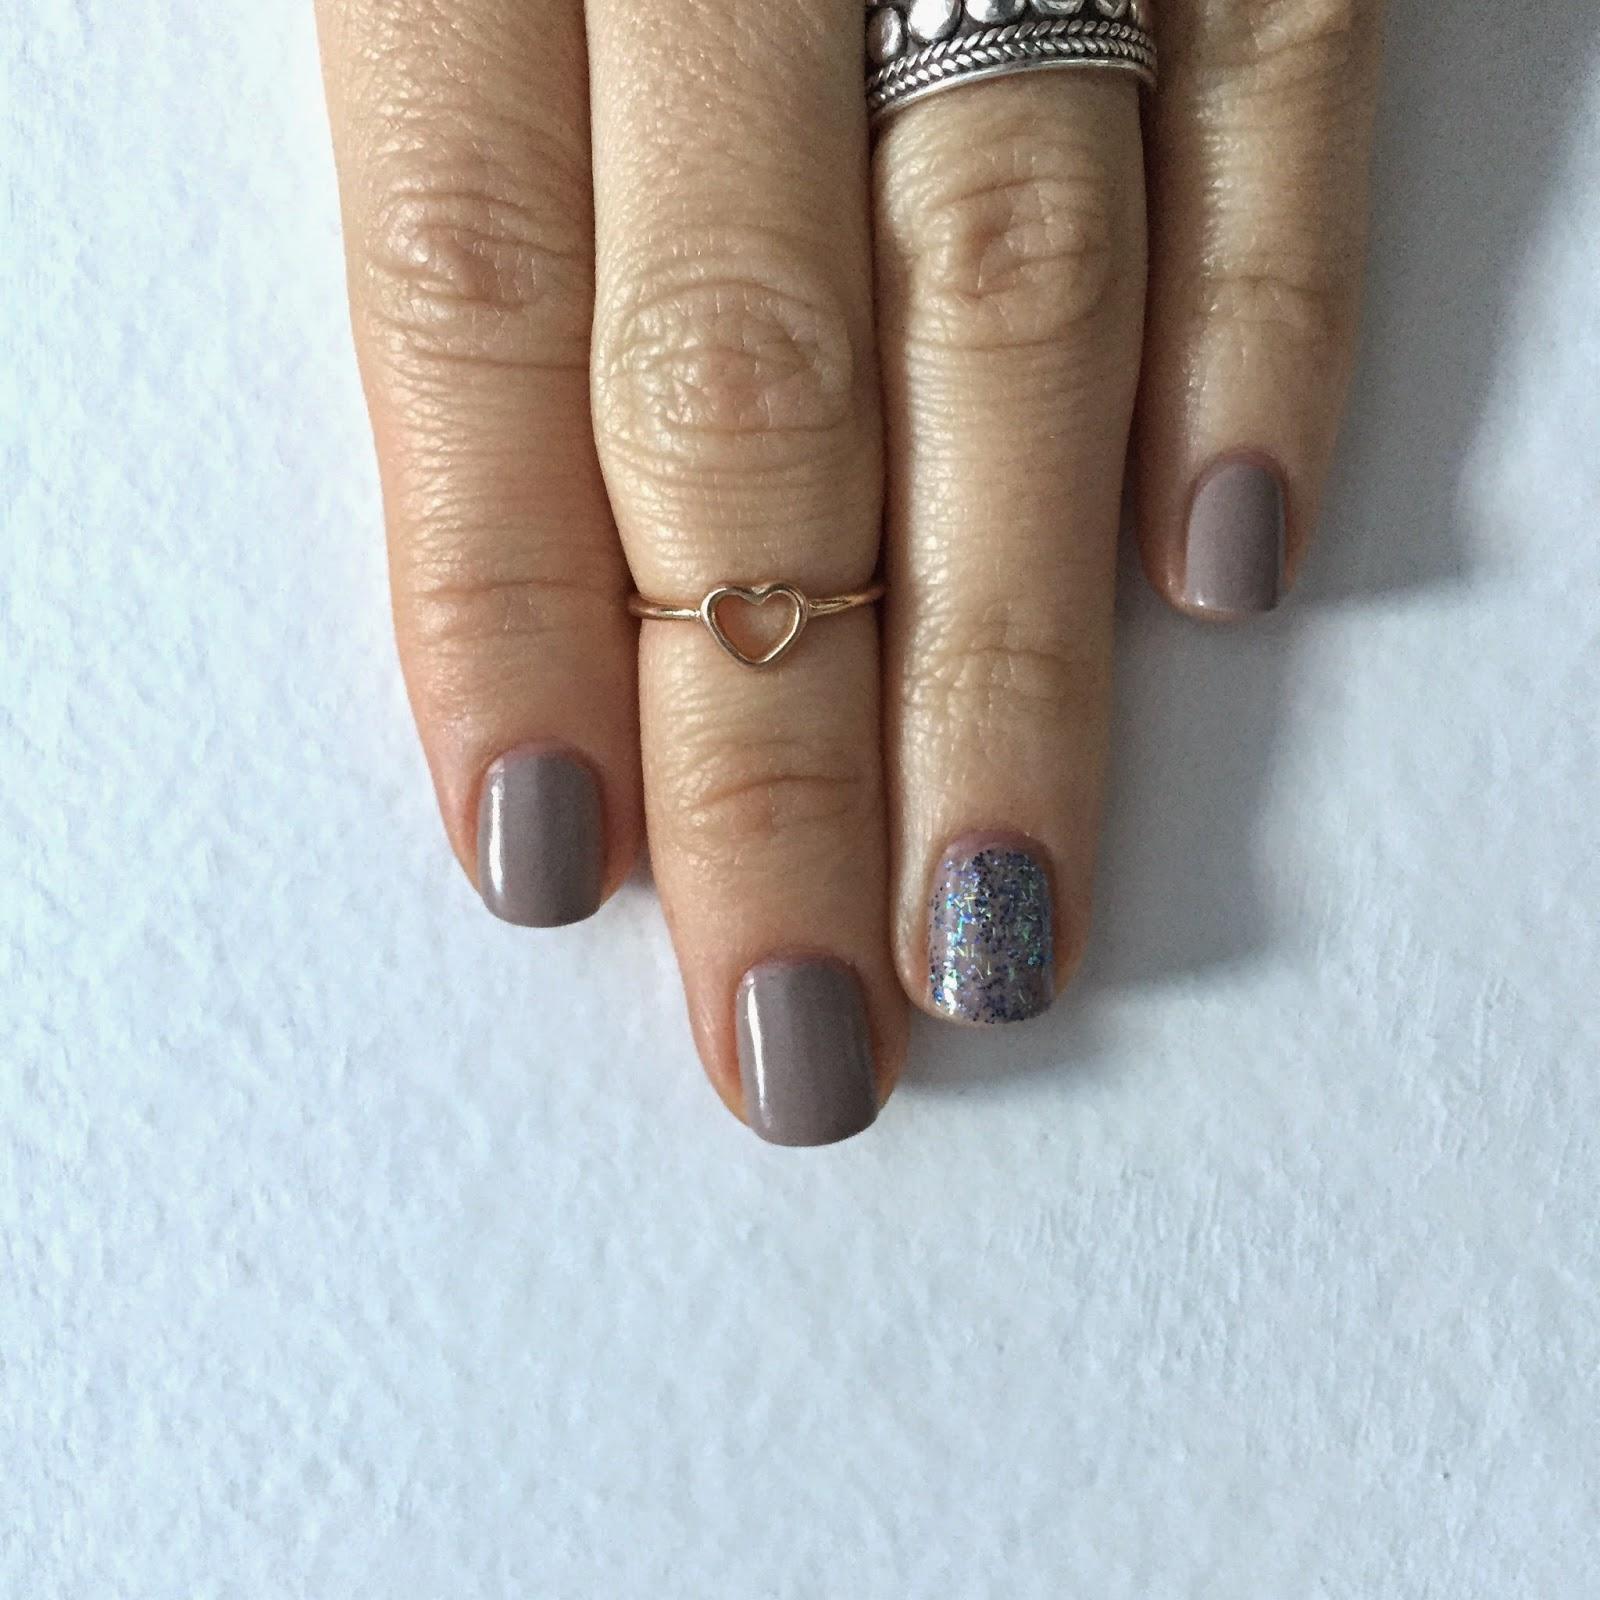 nails2.23.2.jpg